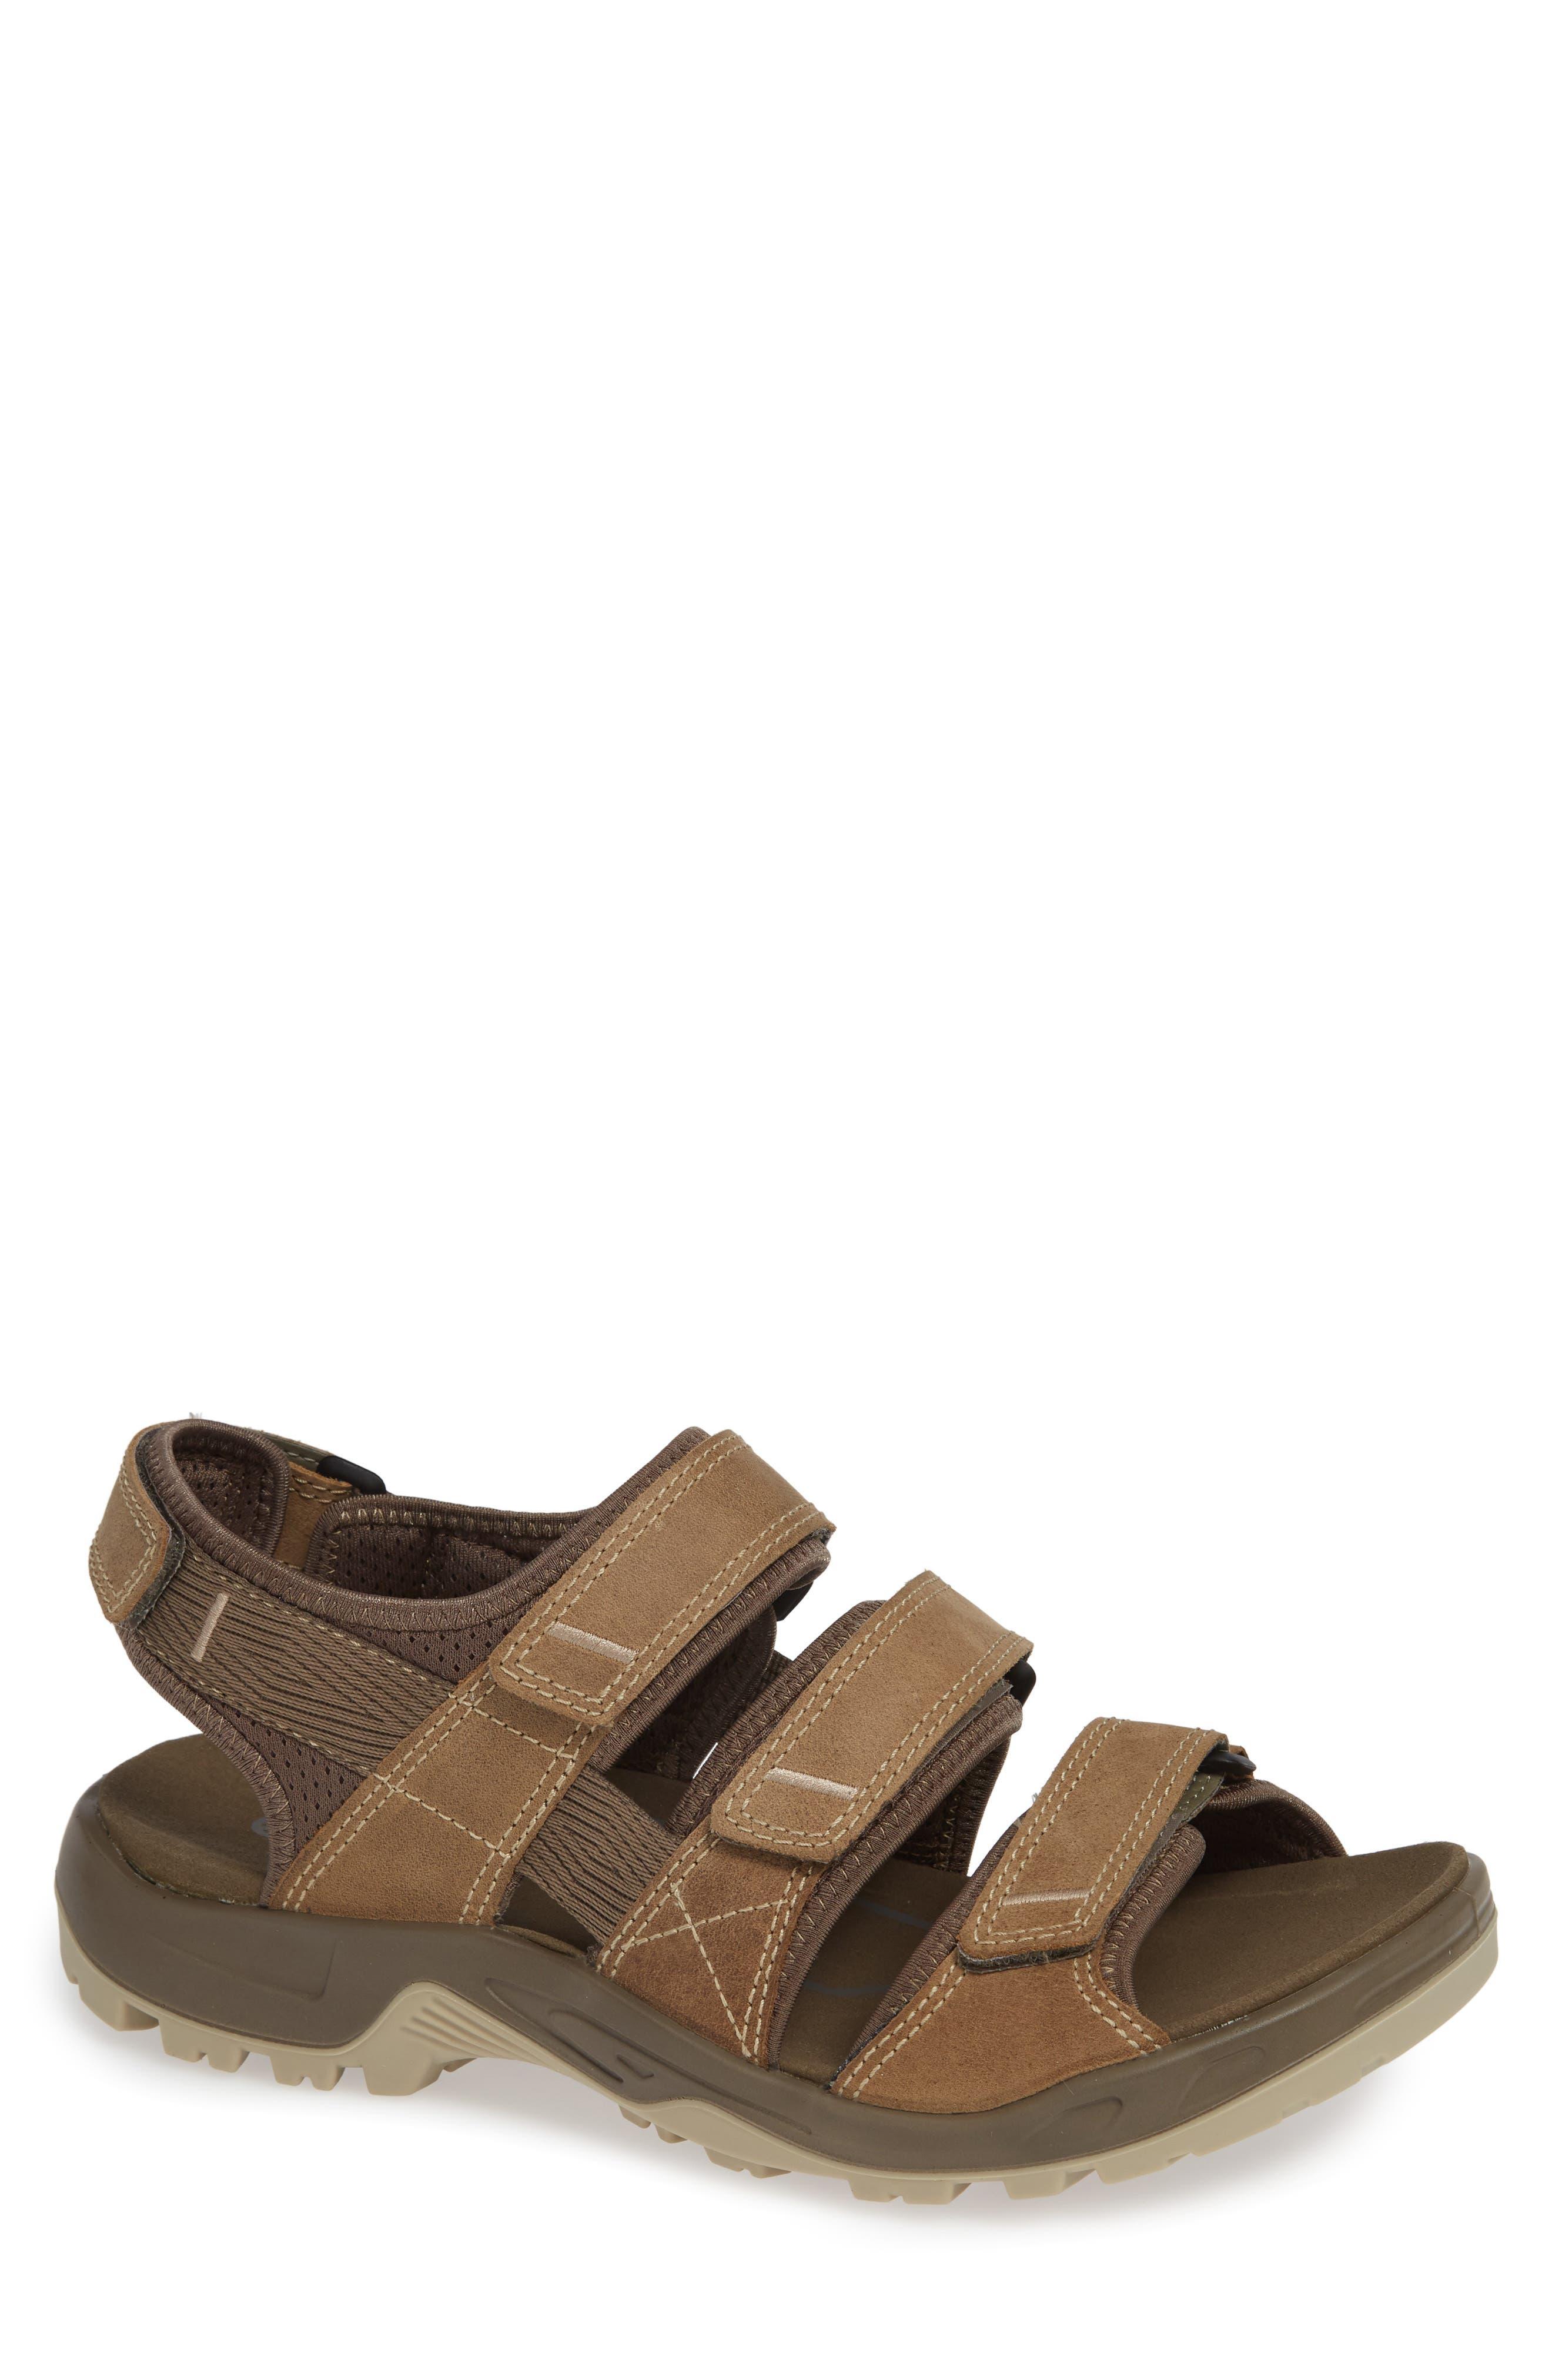 Ecco Offroad Sandal,9.5 - Brown